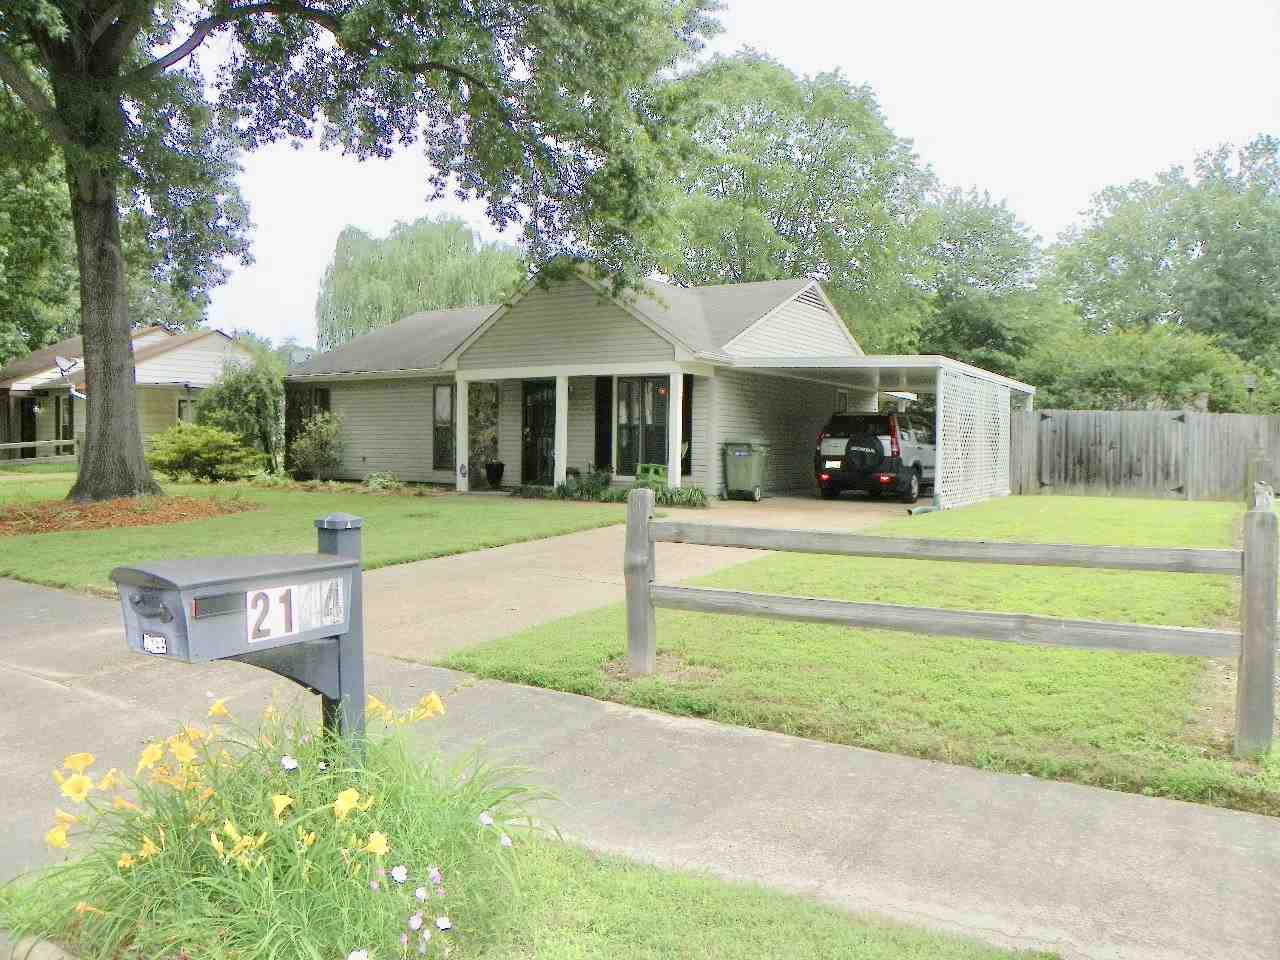 2144 Bobolink, Memphis, TN 38134